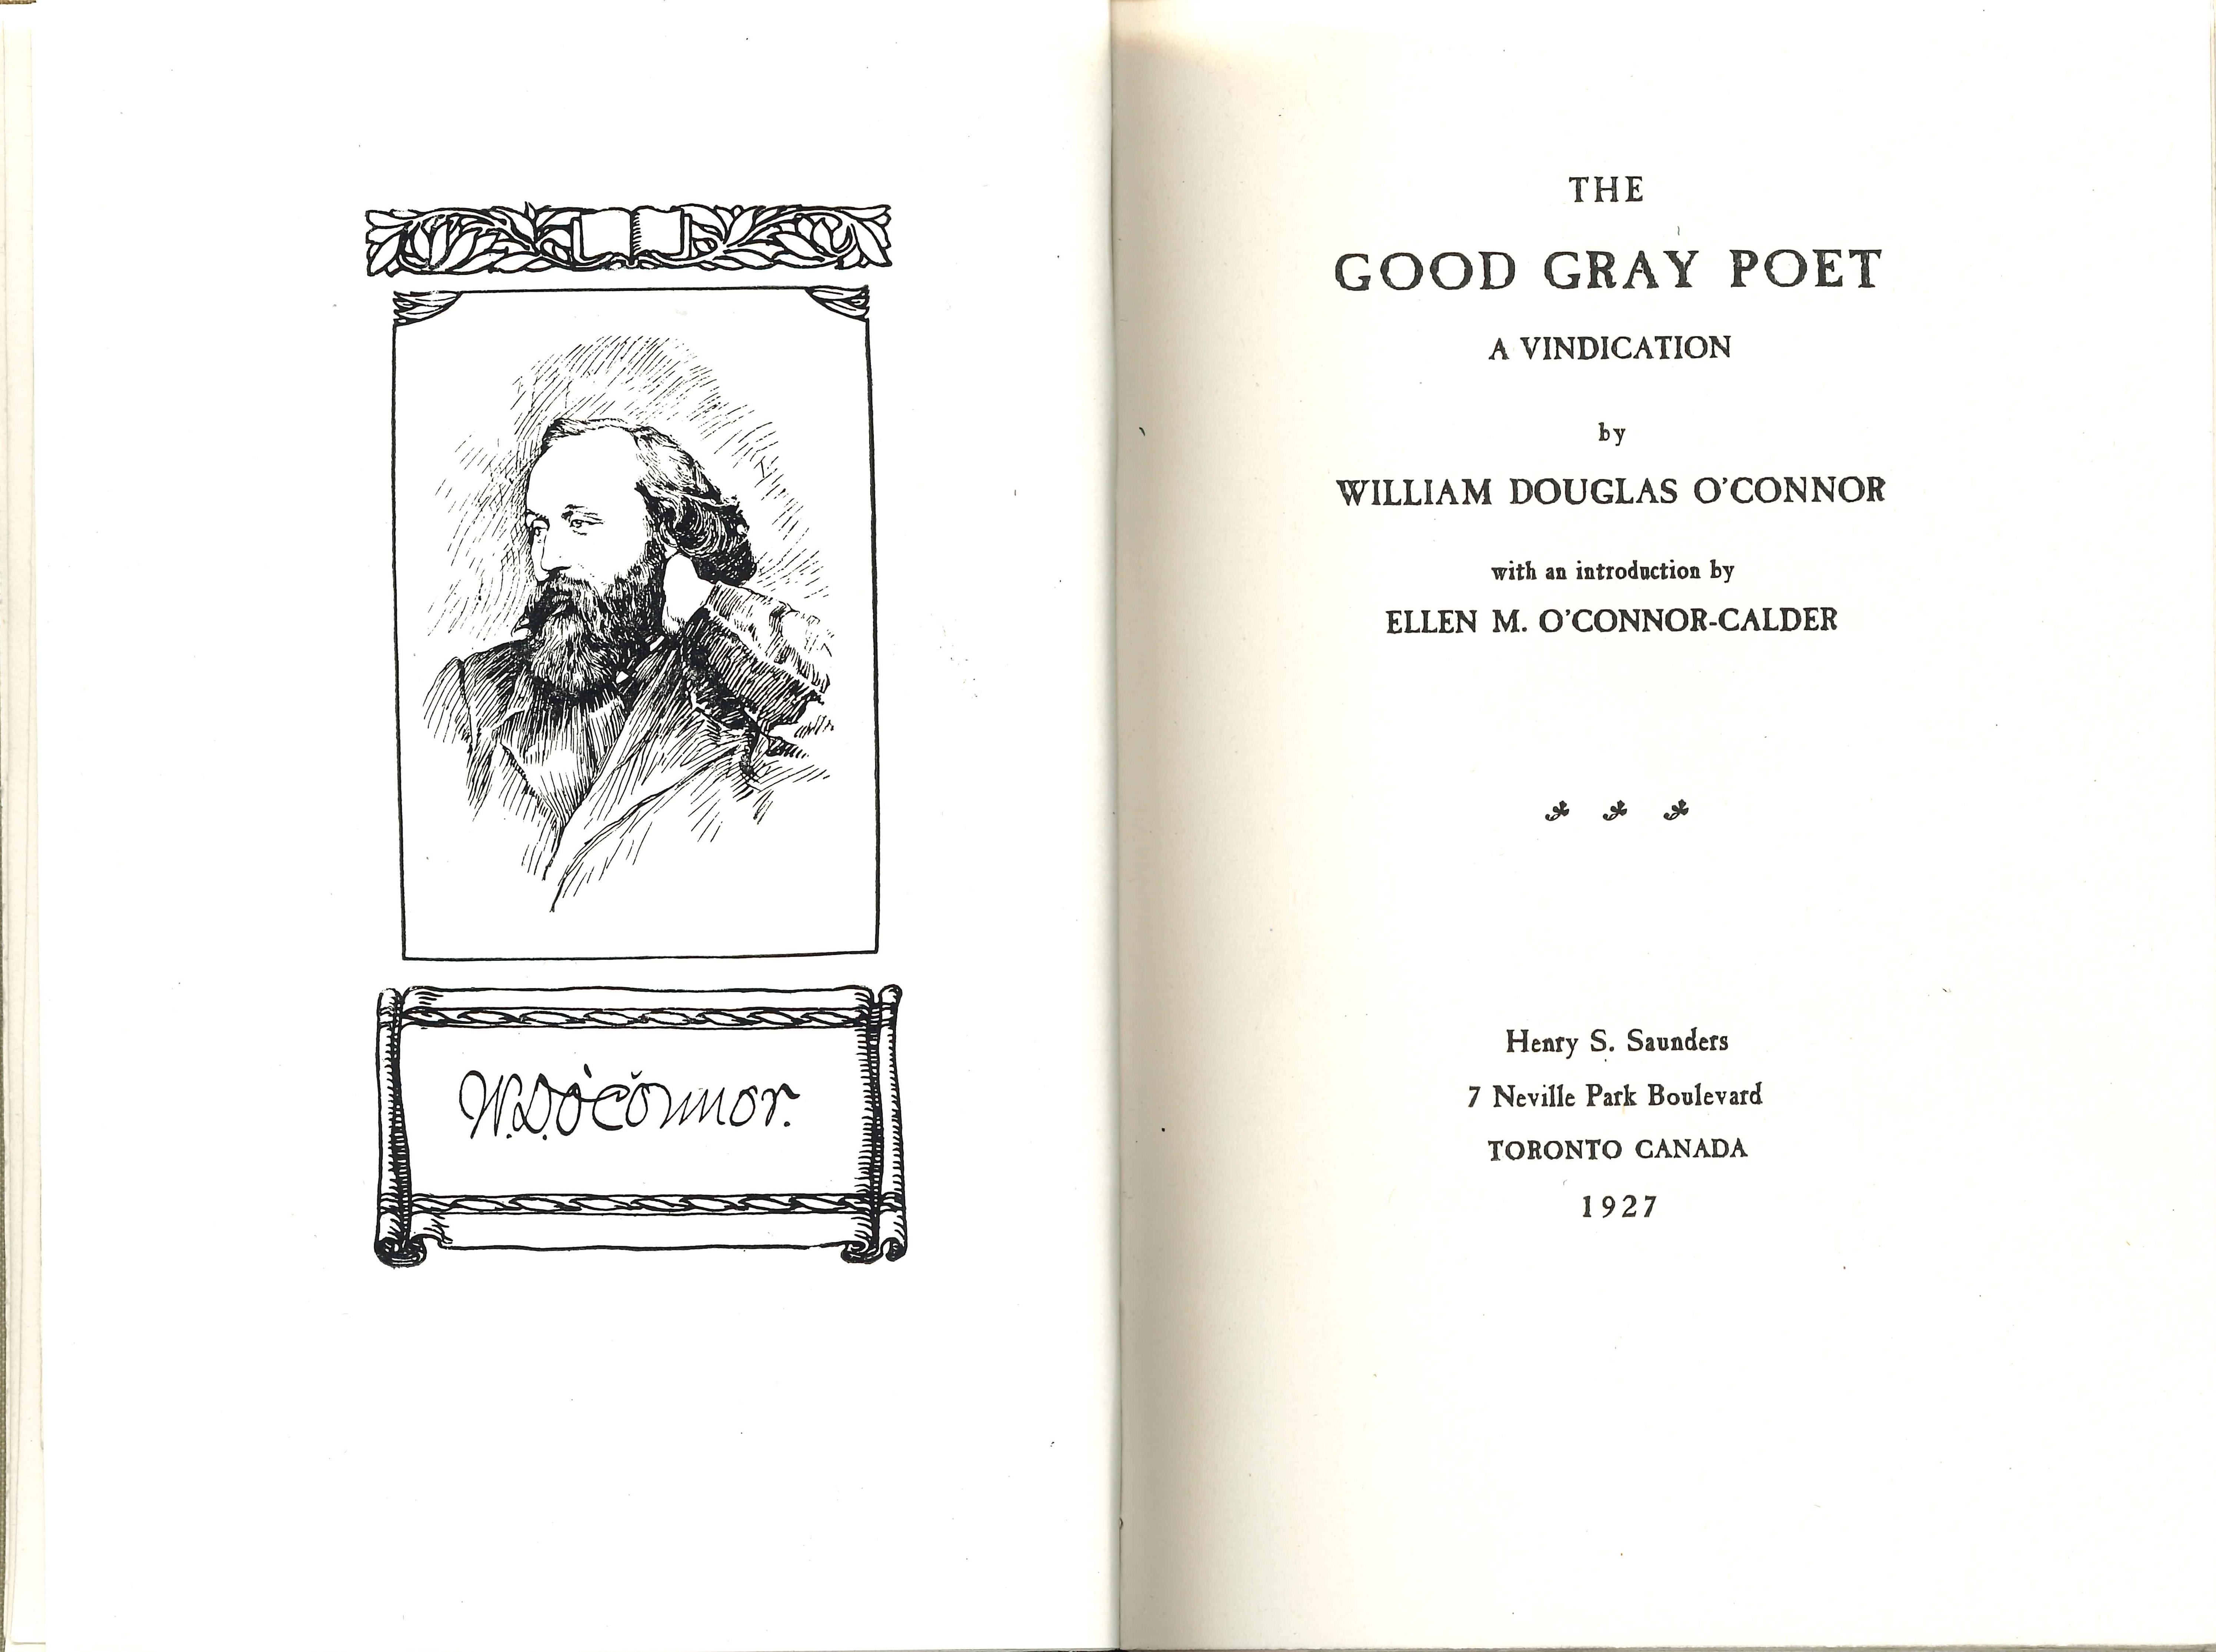 William Douglas O'Connor. The Good Gray Poet: A Vindication. Toronto: H.S. Saunders, 1927.